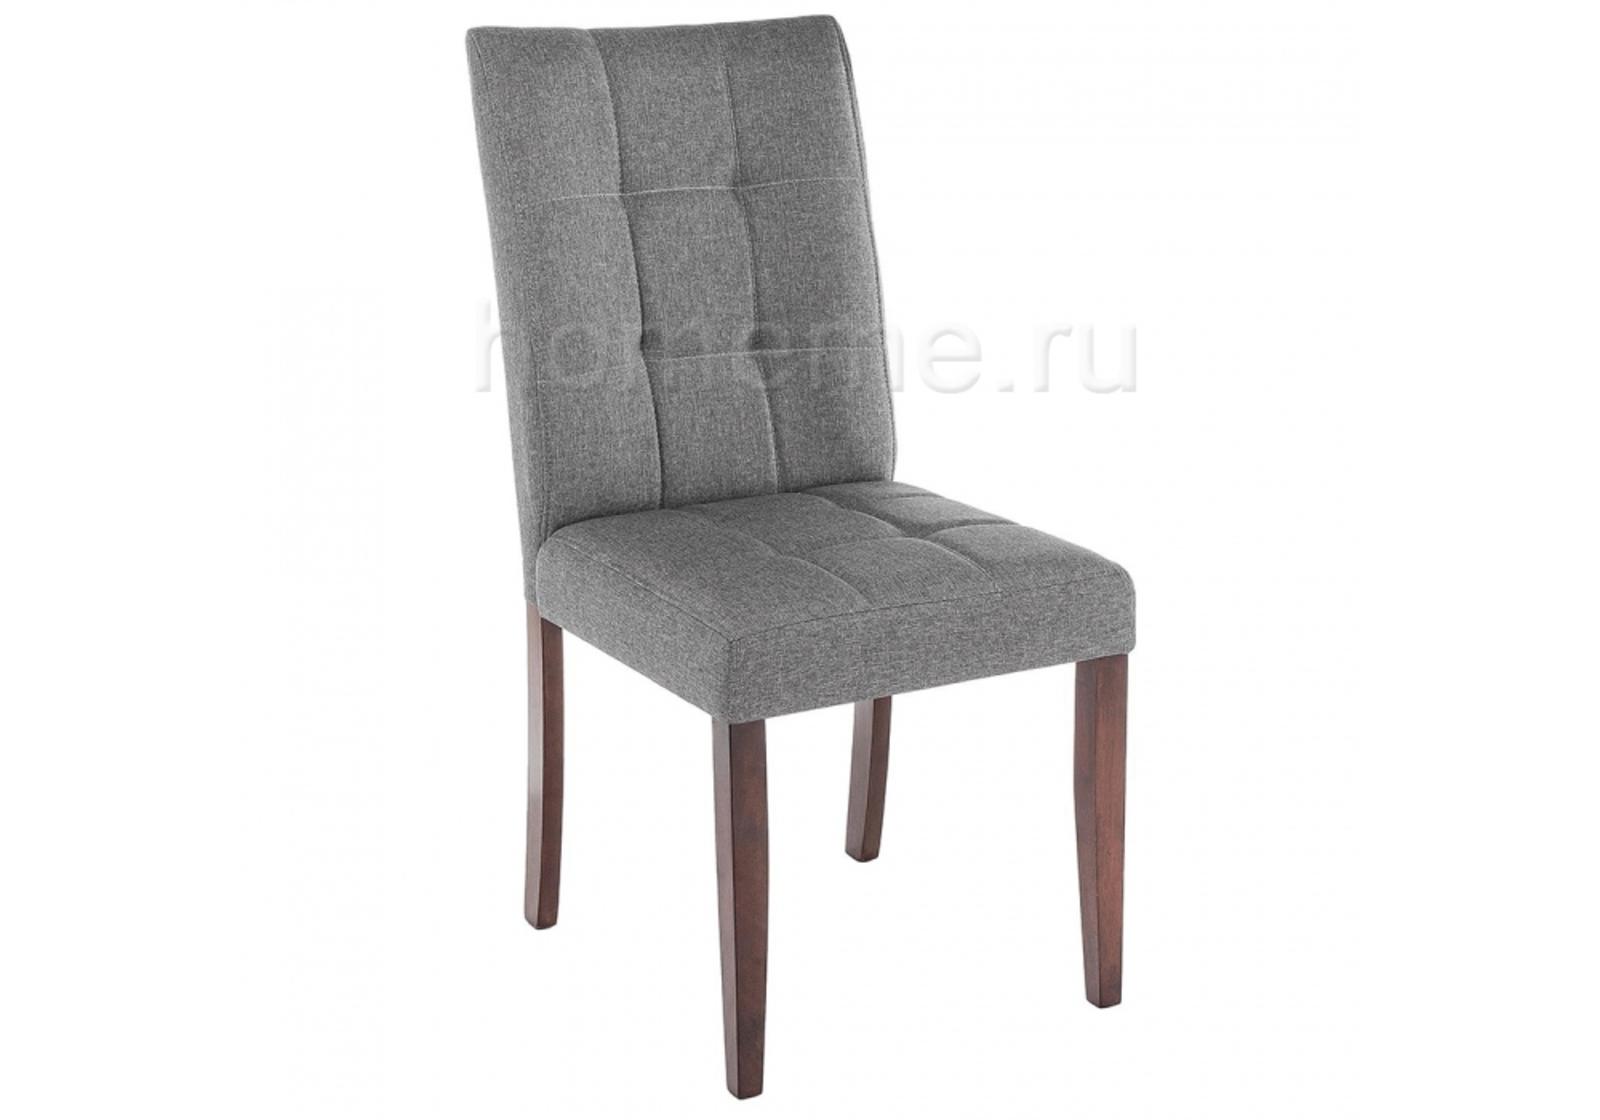 Стул HomeMe Madina dark walnut / fabric grey 11028 от Homeme.ru